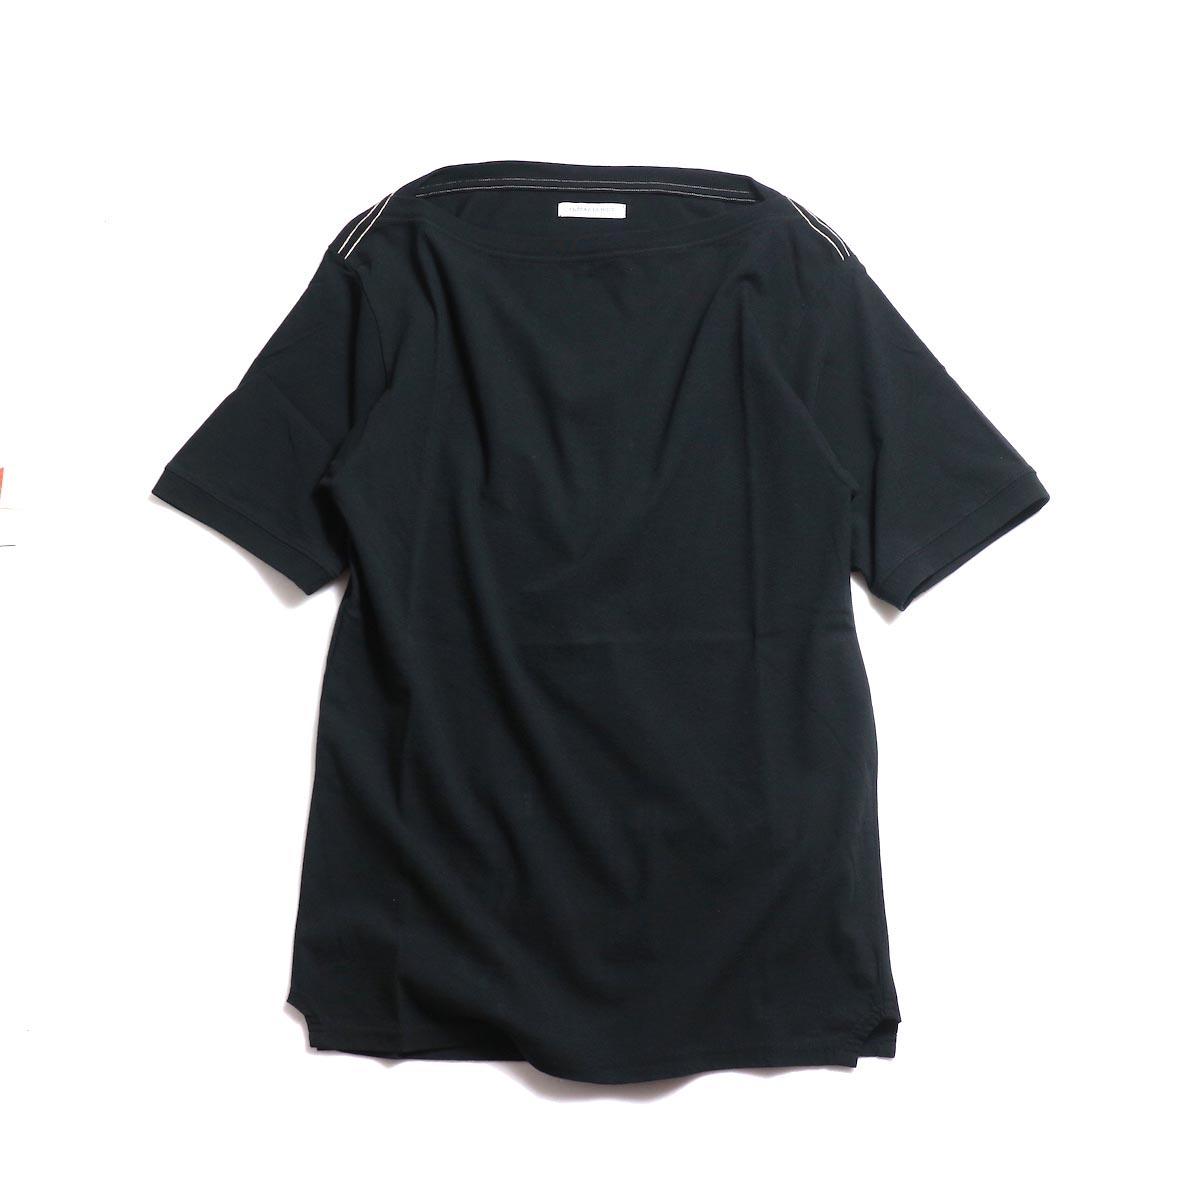 FUMIKA UCHIDA / Cotton Straight Neck Over Shoulder Tee -Black